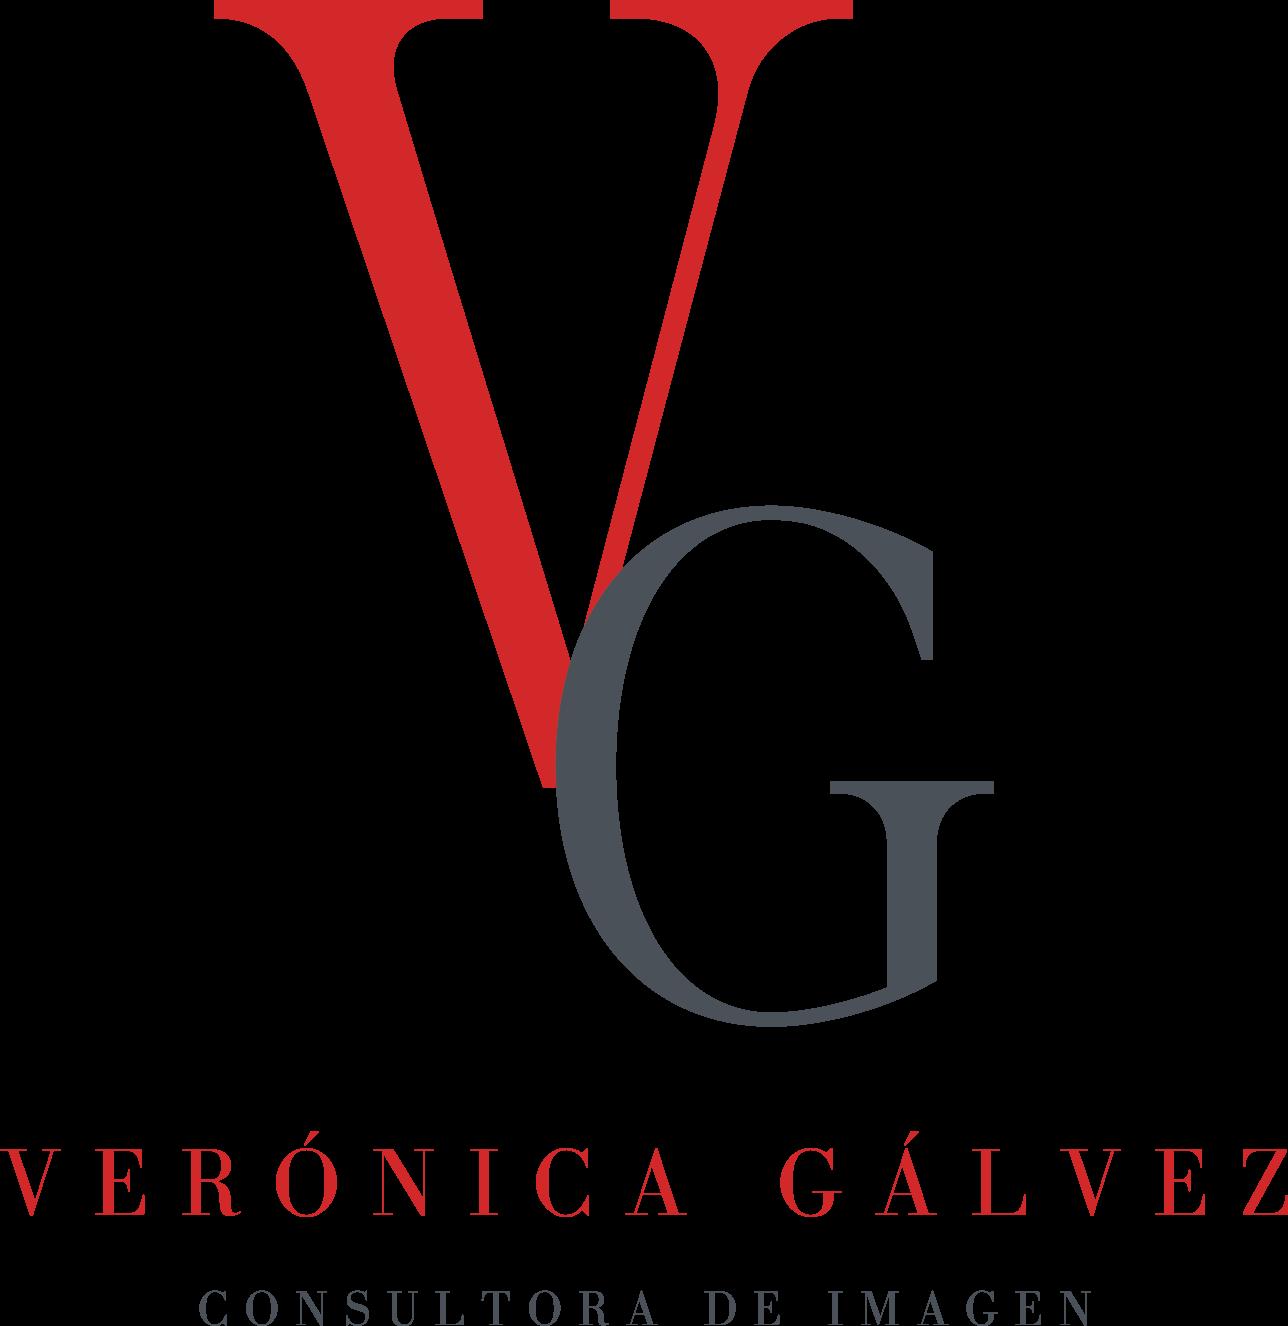 cropped-Logotipo-Veronica-Galvez-1.png